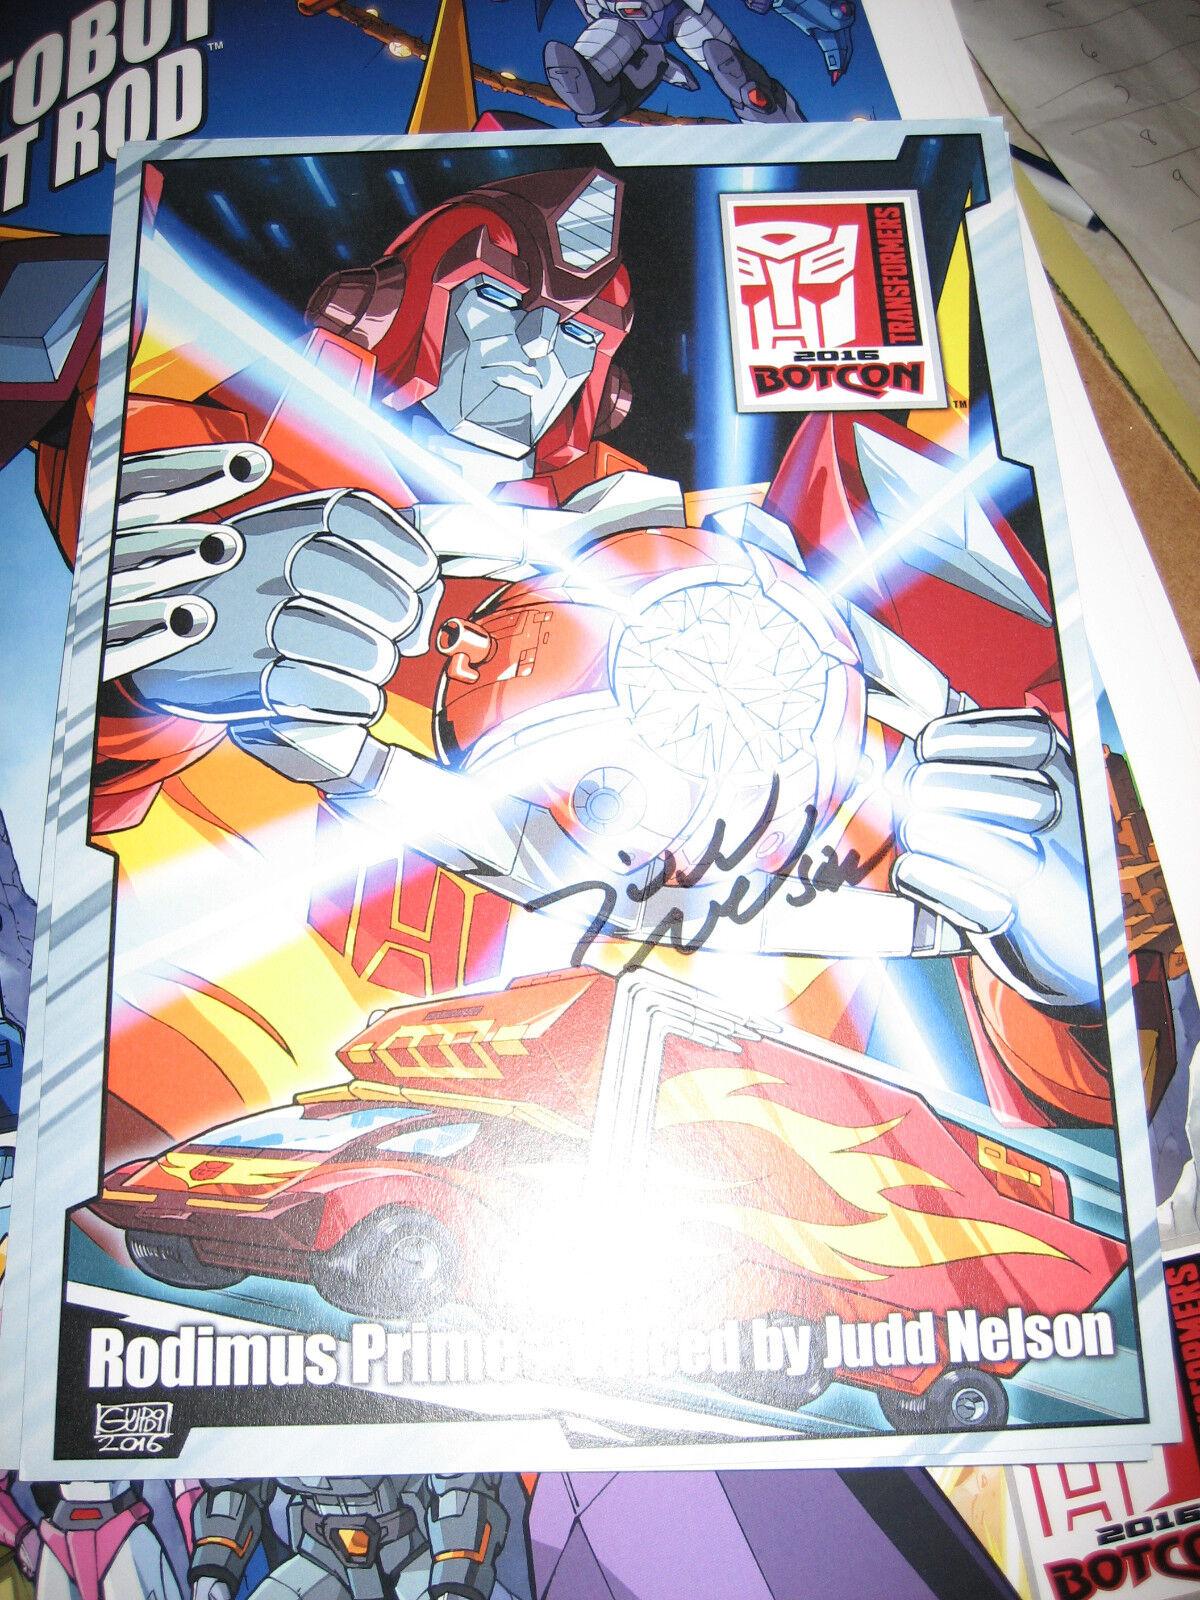 2016 Transformers BotCon G1 Rodimus SIGNED by Judd Nelson OverGrößed Card 10